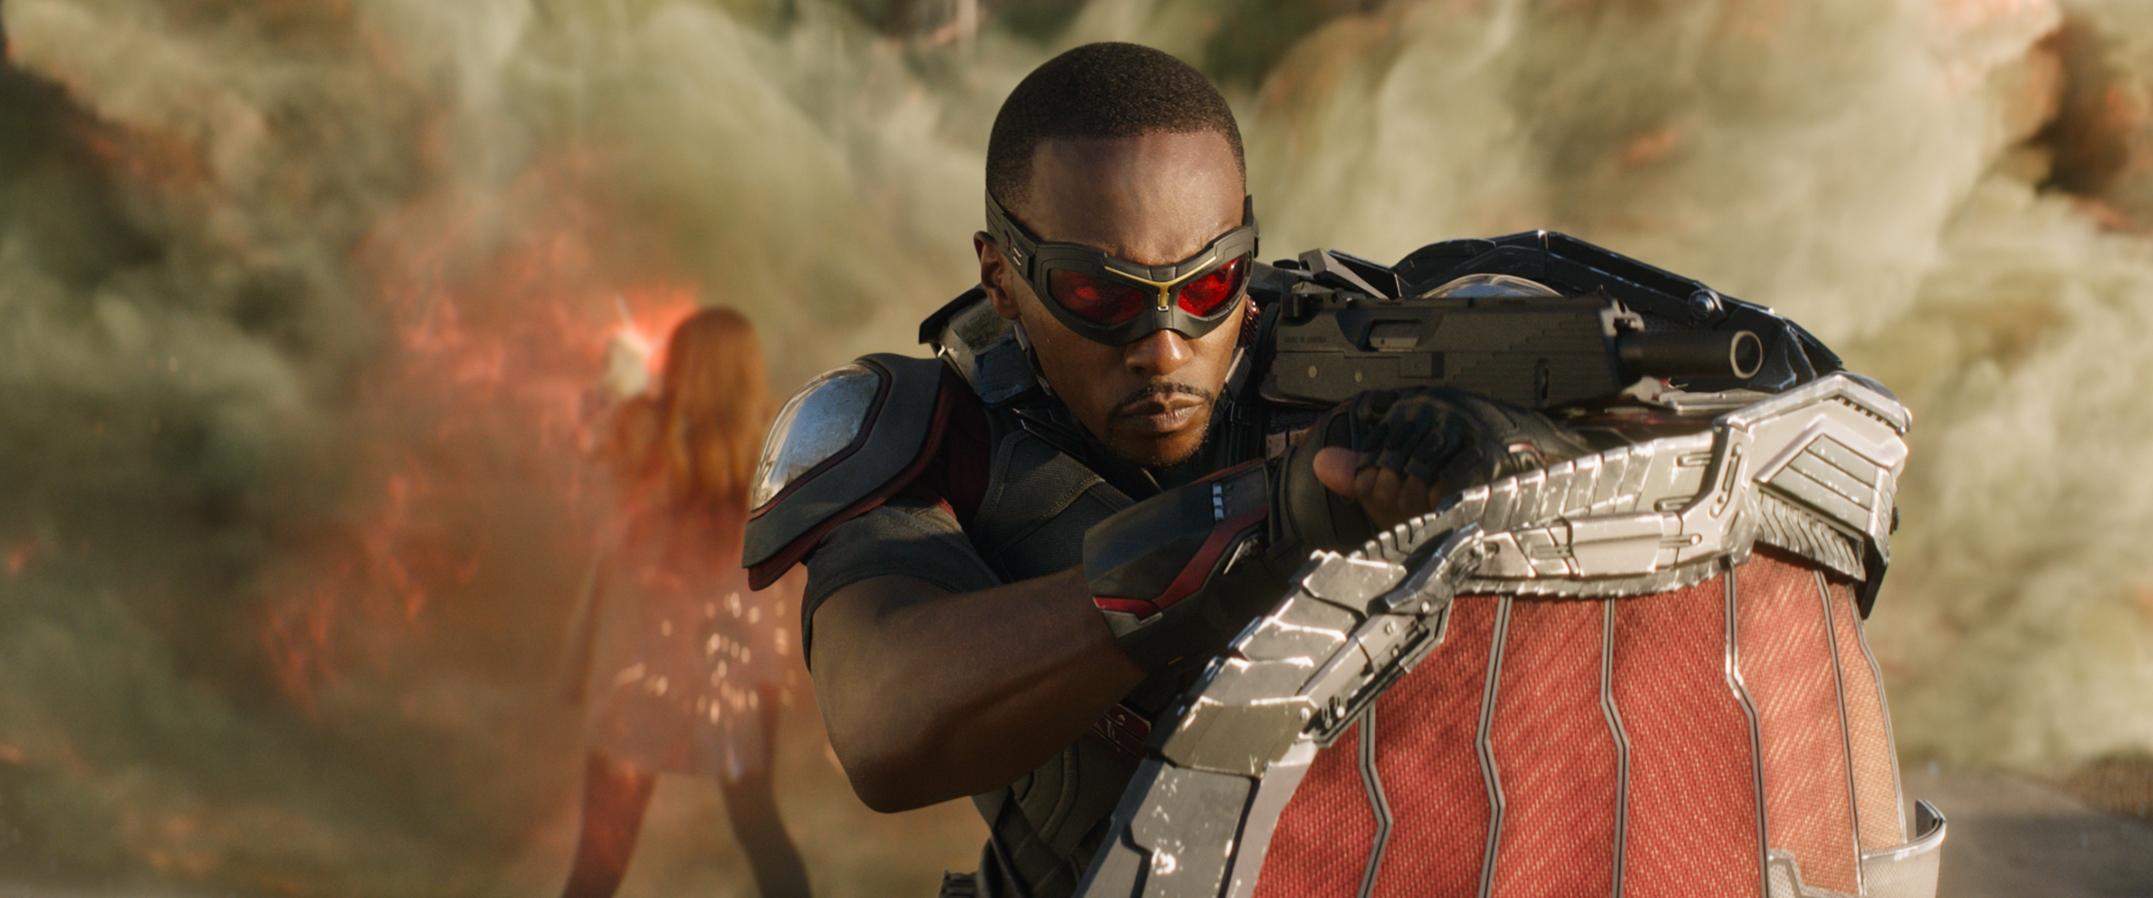 File:Captain America Civil War EW Still 03.jpg